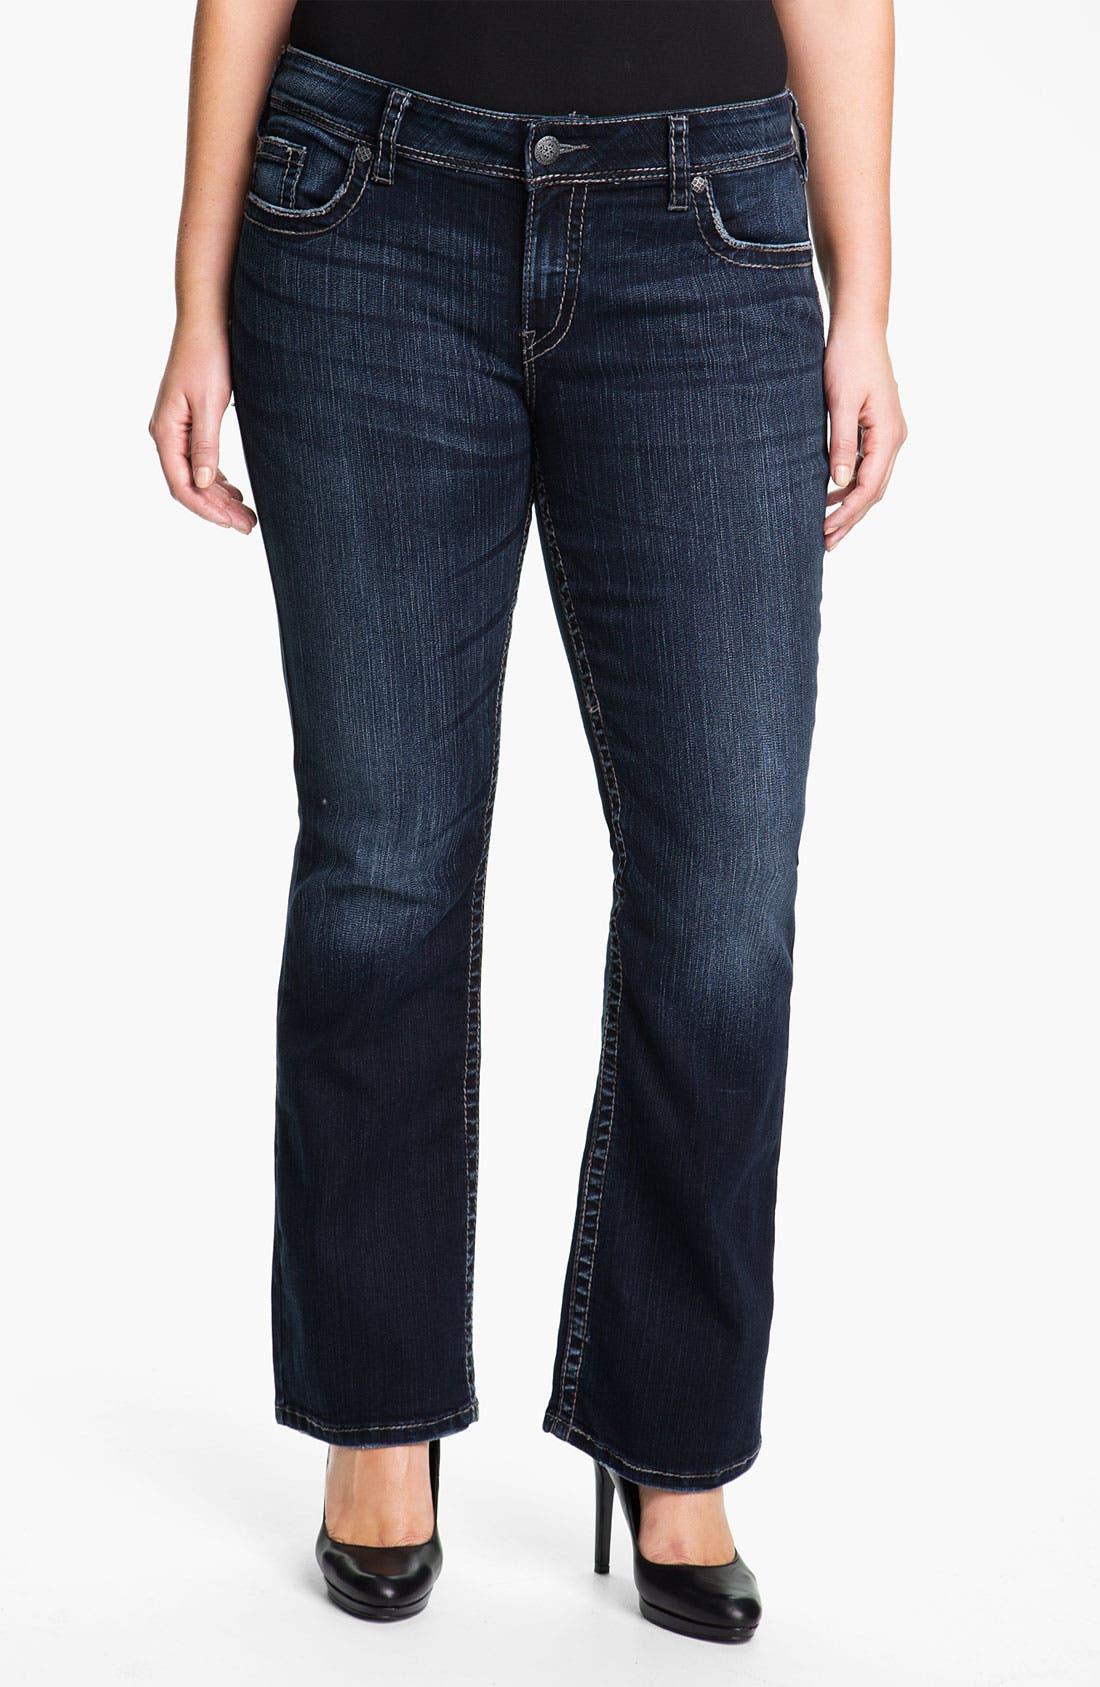 Alternate Image 1 Selected - Silver Jeans Co. 'Suki' Surplus Bootcut Jeans (Juniors Plus)